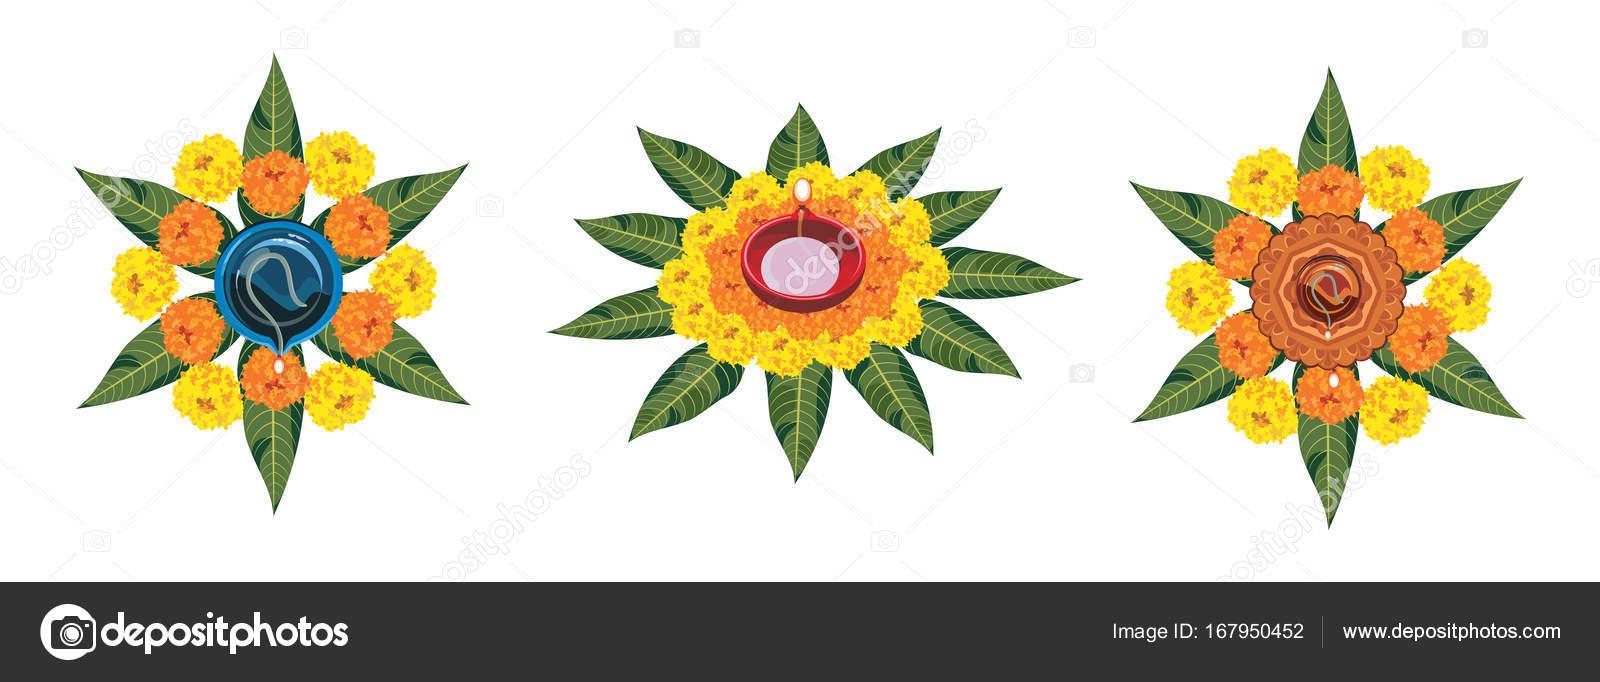 Stock Illustration Of Flower Rangoli For Diwali Or Pongal Or Onam Made Using Marigold Or Zendu